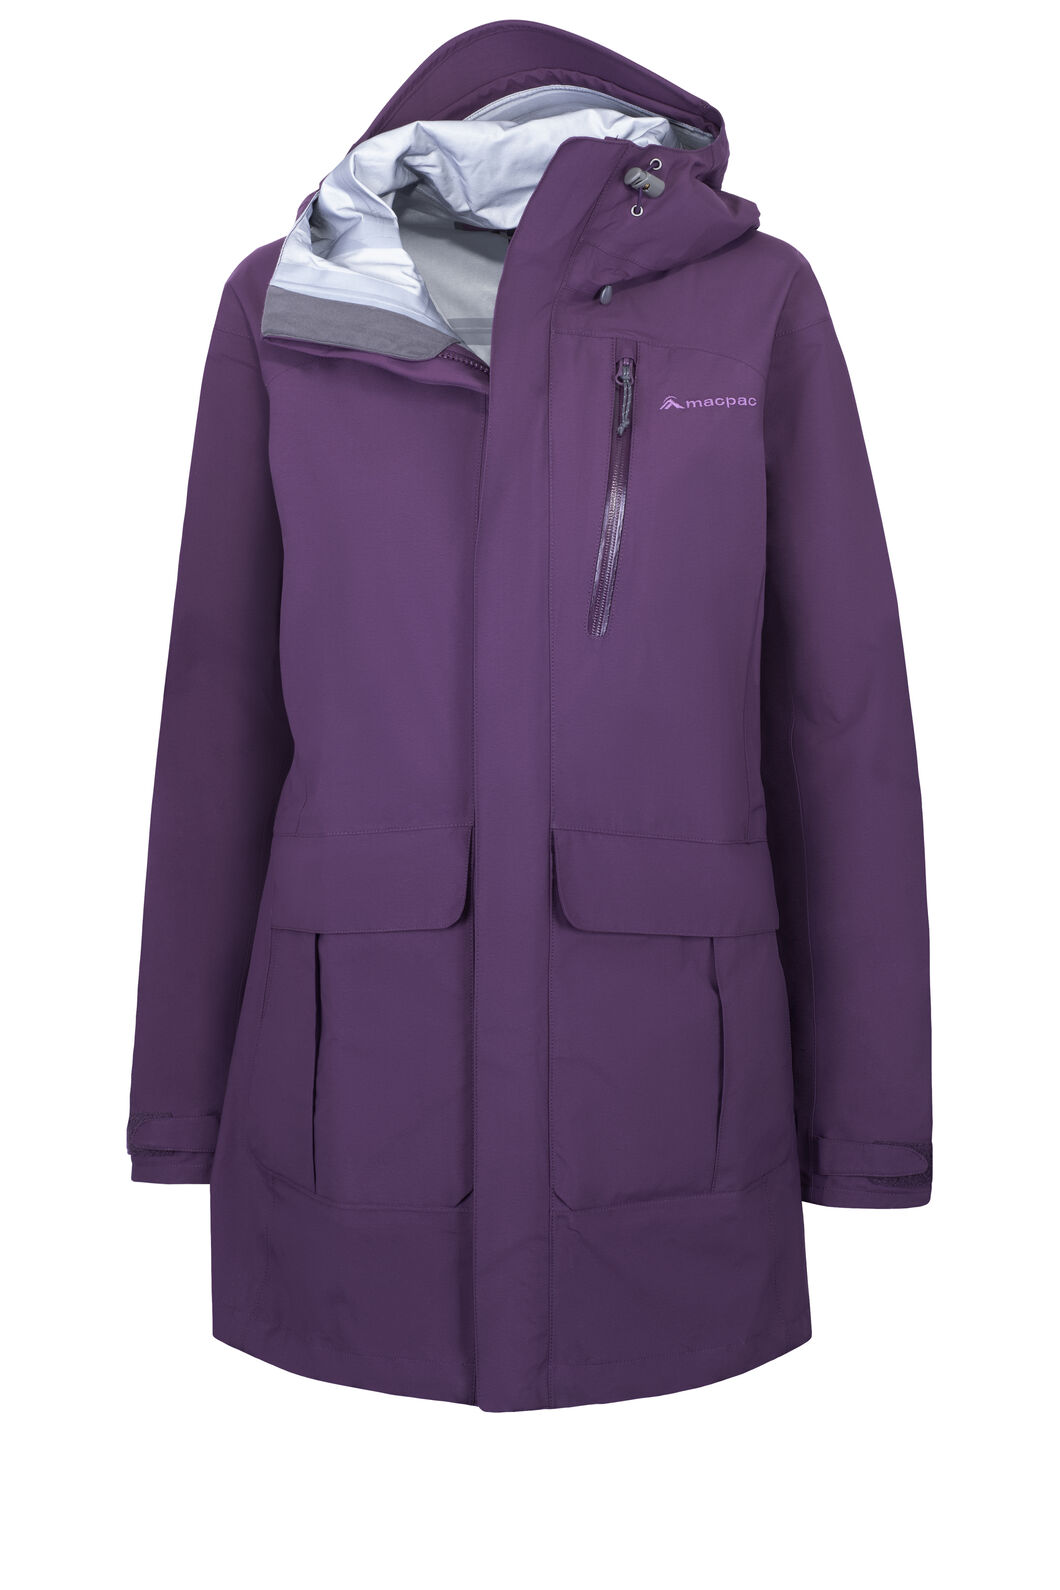 Macpac Copland Long Rain Jacket — Women's, Blackberry Wine, hi-res